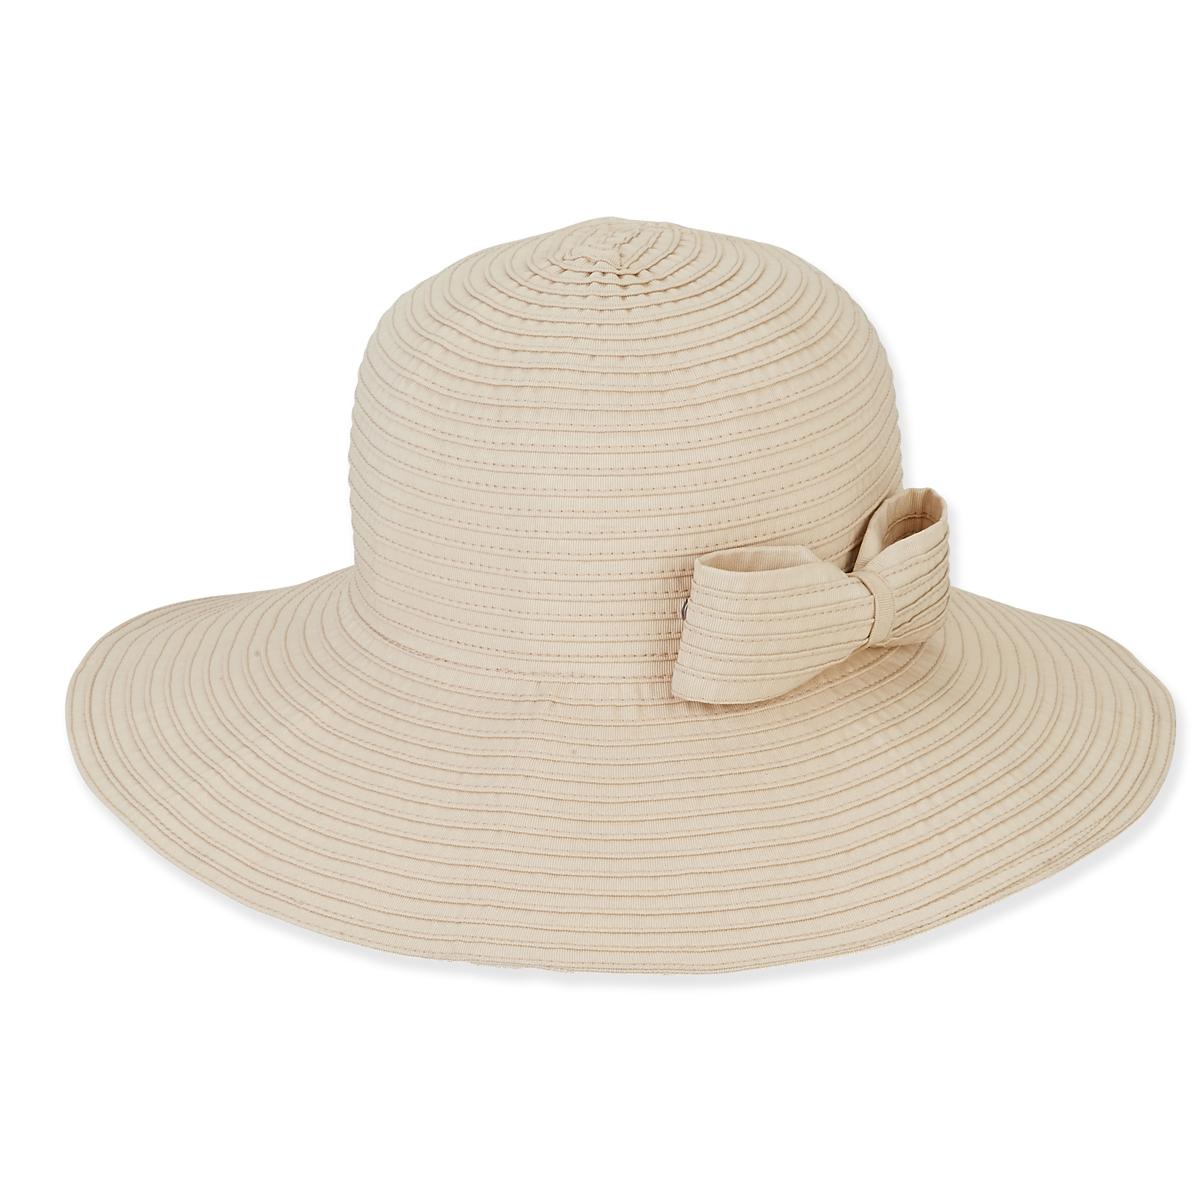 38900dff98623b FOLDABLE HAT W/BOW TRIM - Sun 'N' Sand Accessories